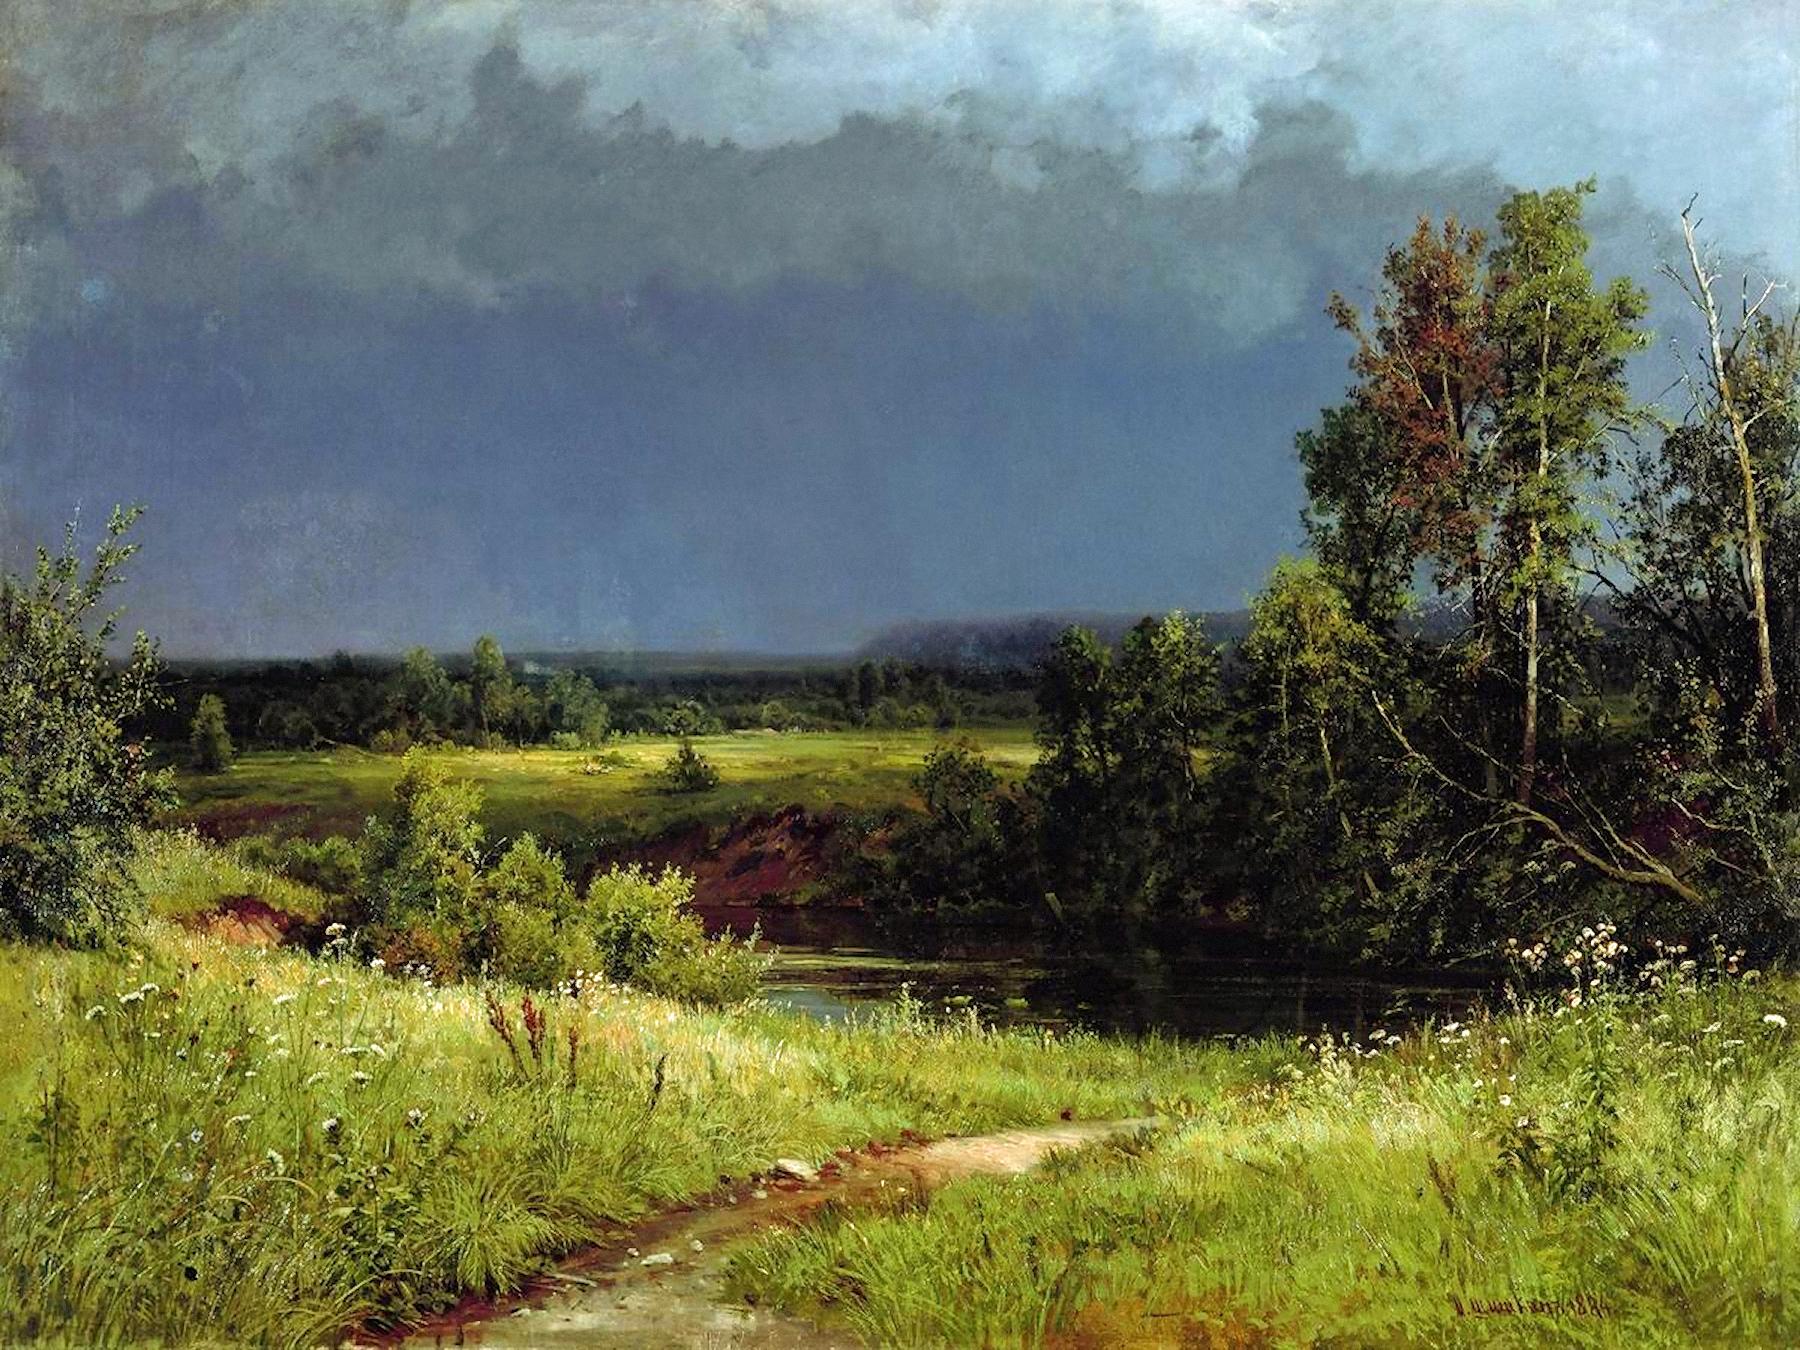 00 Ivan Shishkin. Before the Storm. 1884